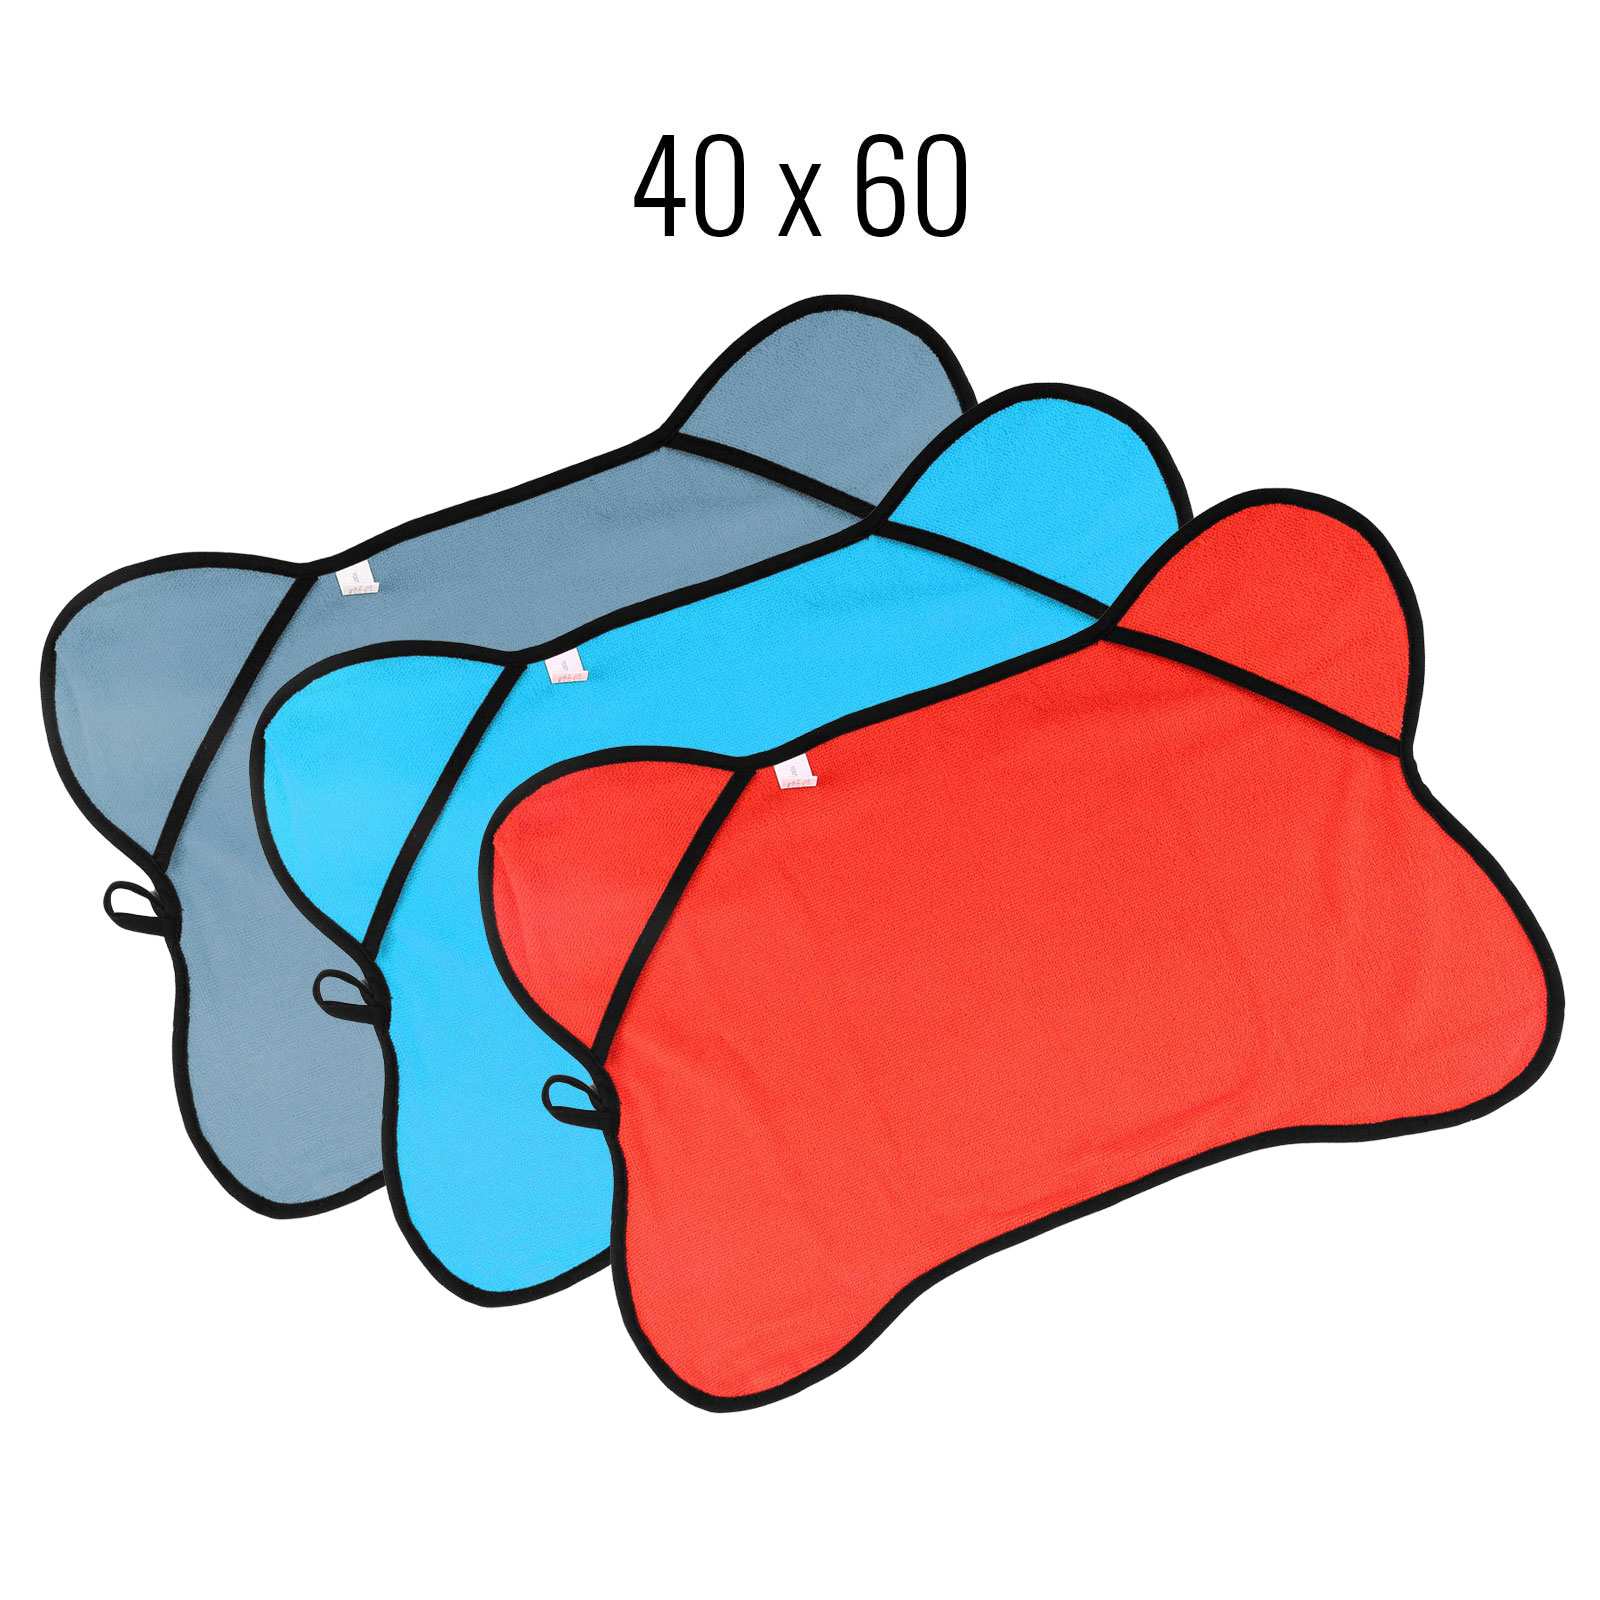 Haustierhandtuch 40x60 cm rot, blau, blau/grau 3er Set